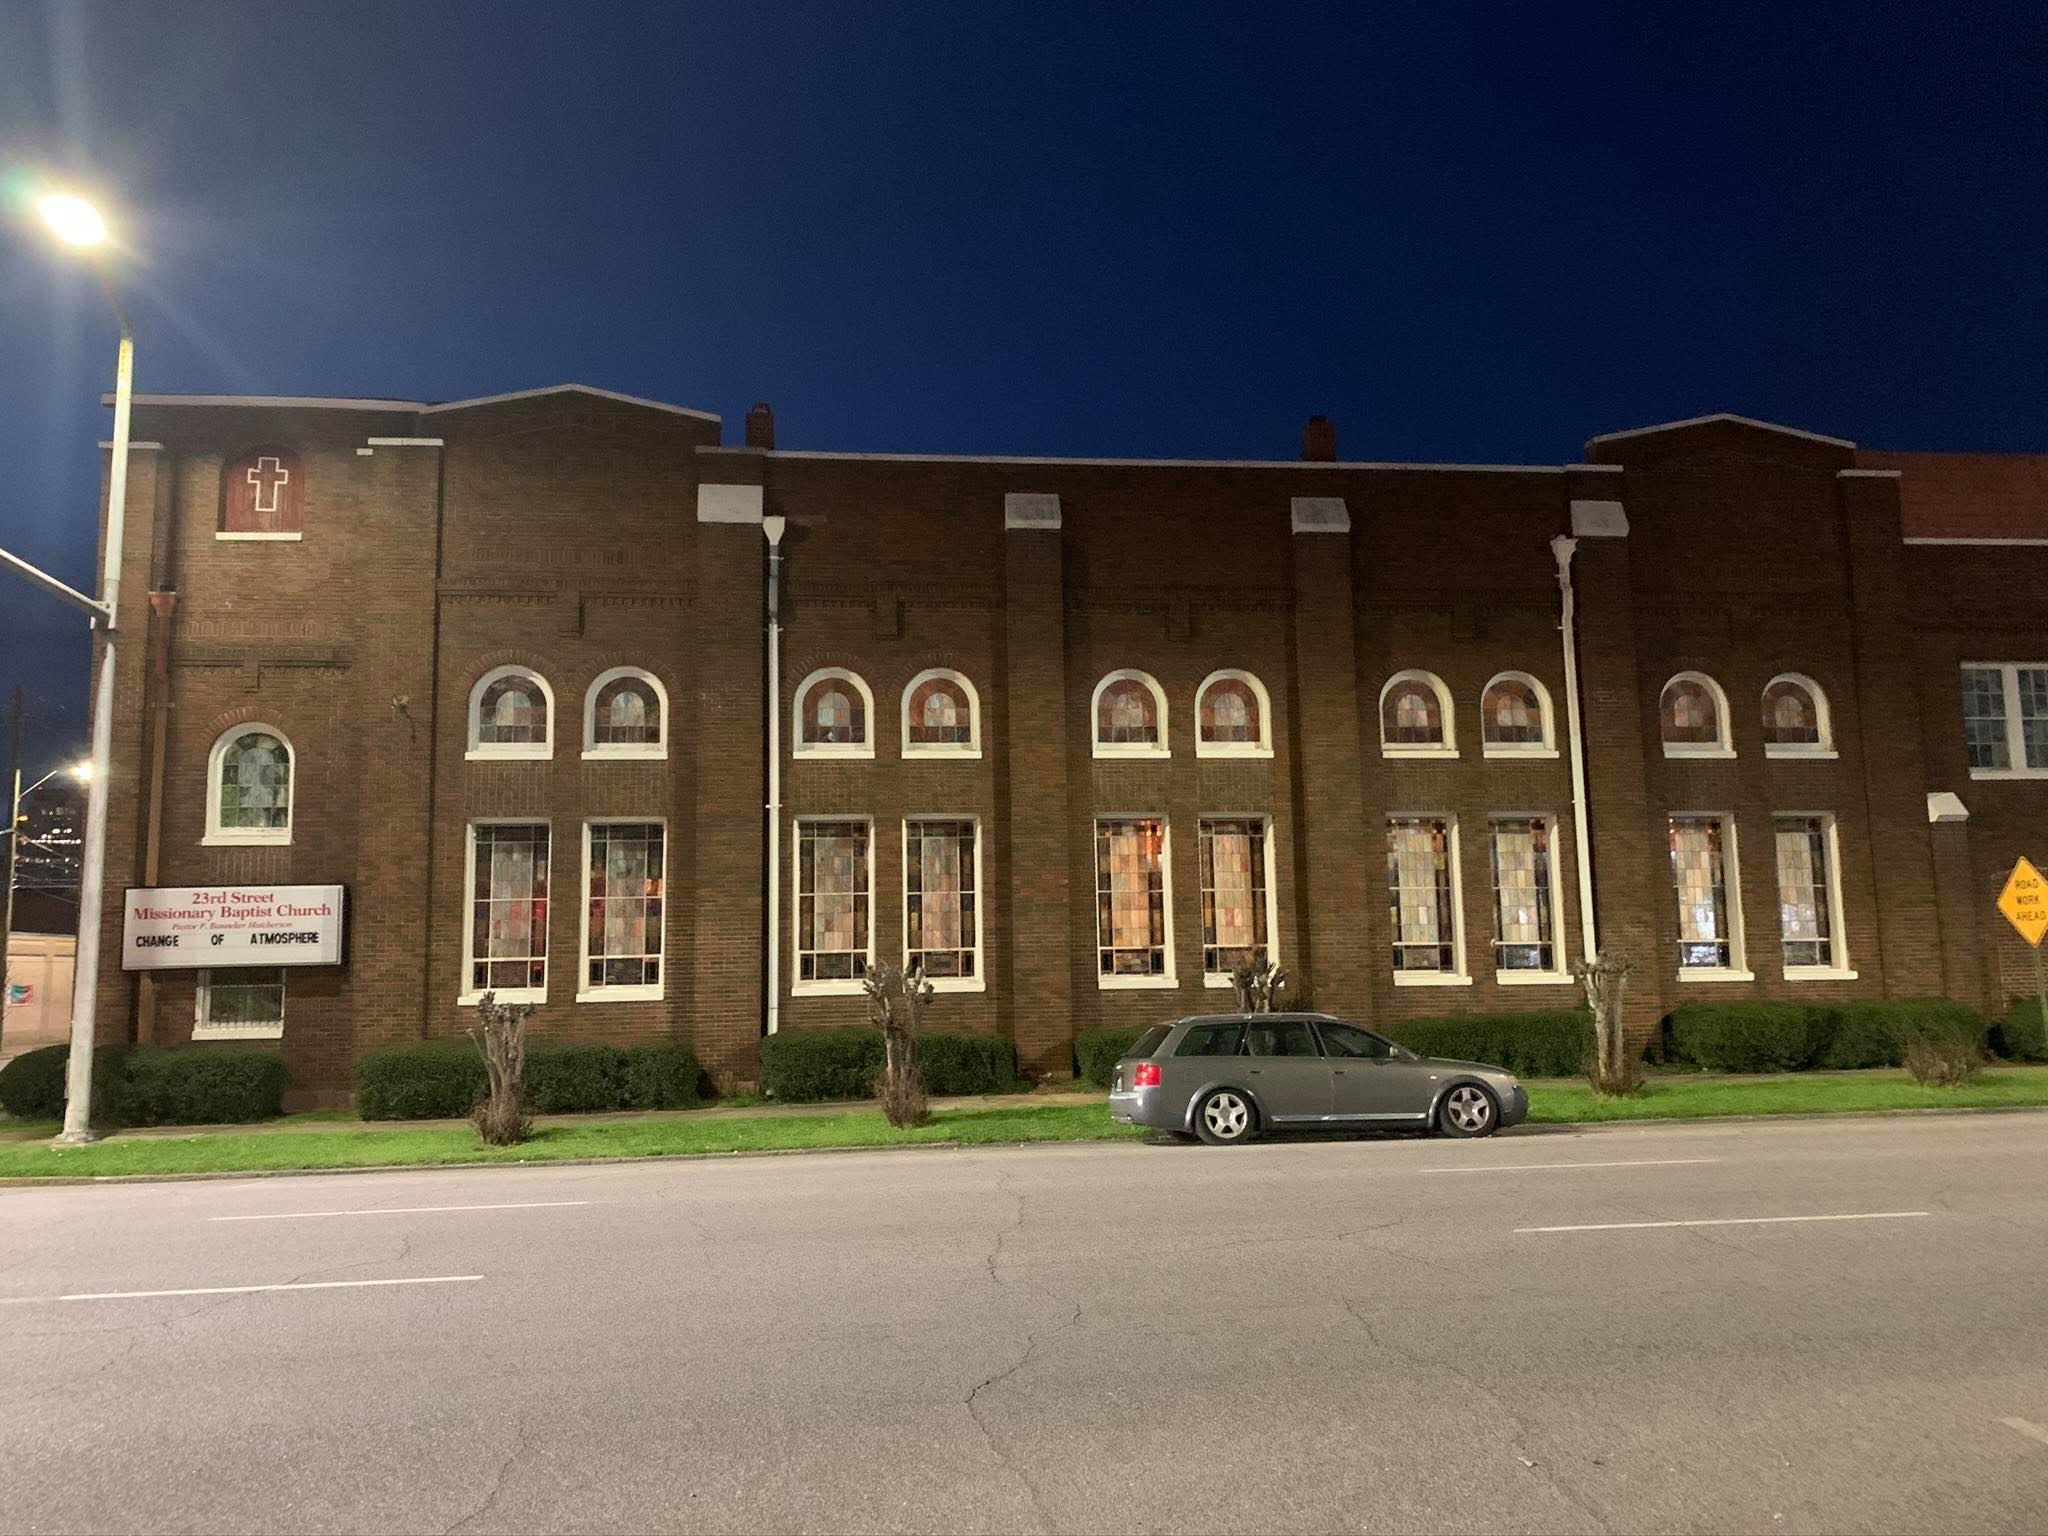 23rd Street Baptist Church - South